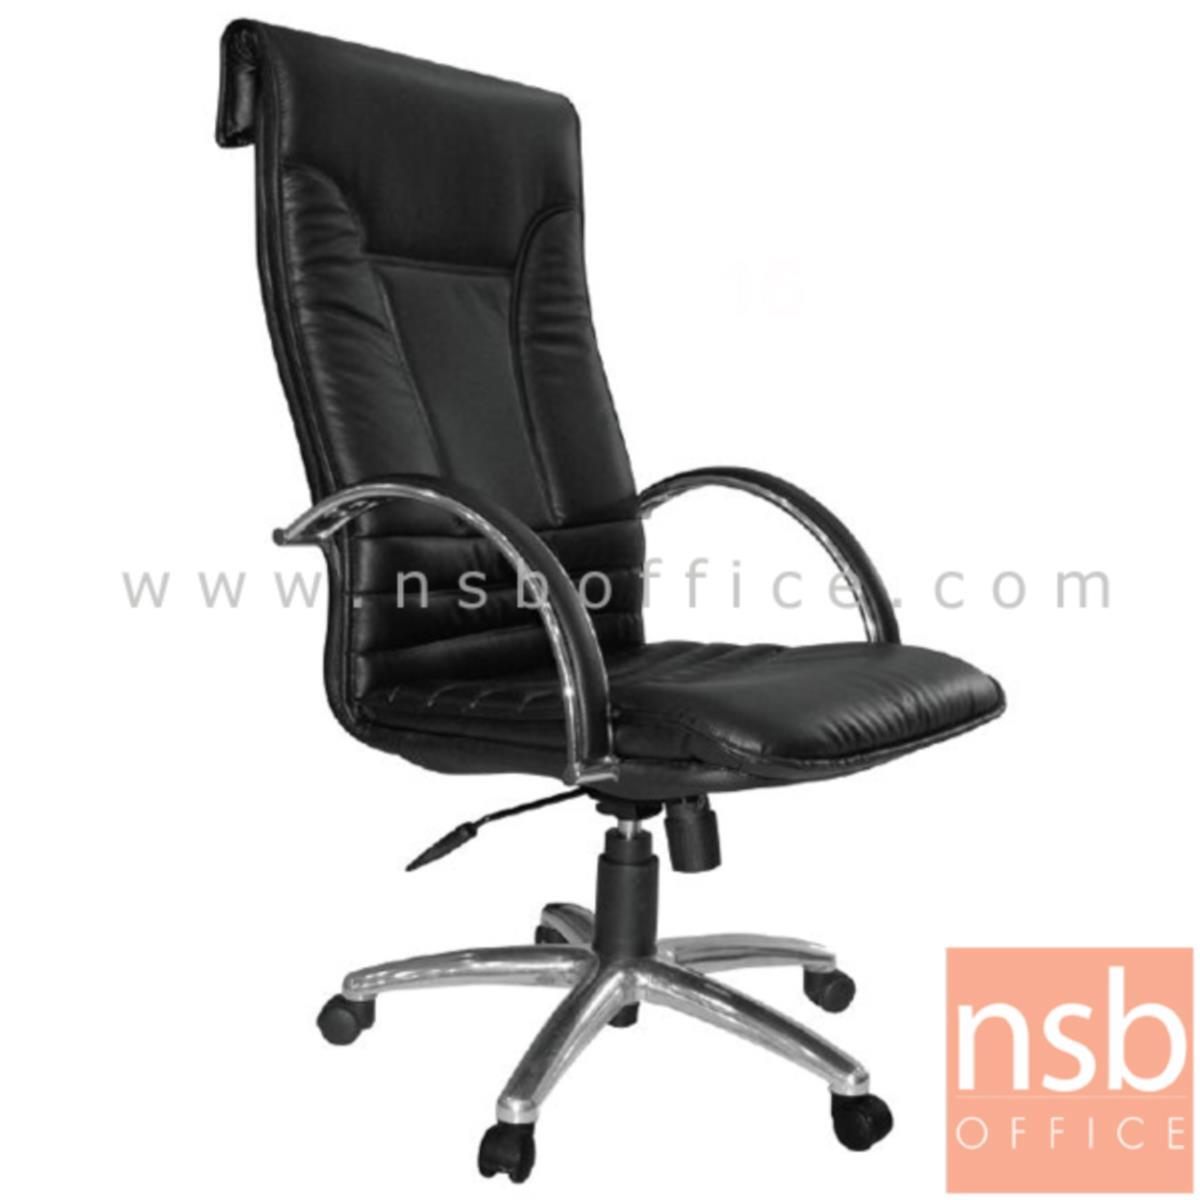 B01A352:เก้าอี้ผู้บริหาร รุ่น Airness (แอร์เนส)  โช๊คแก๊ส มีก้อนโยก ขาอลูมิเนียม